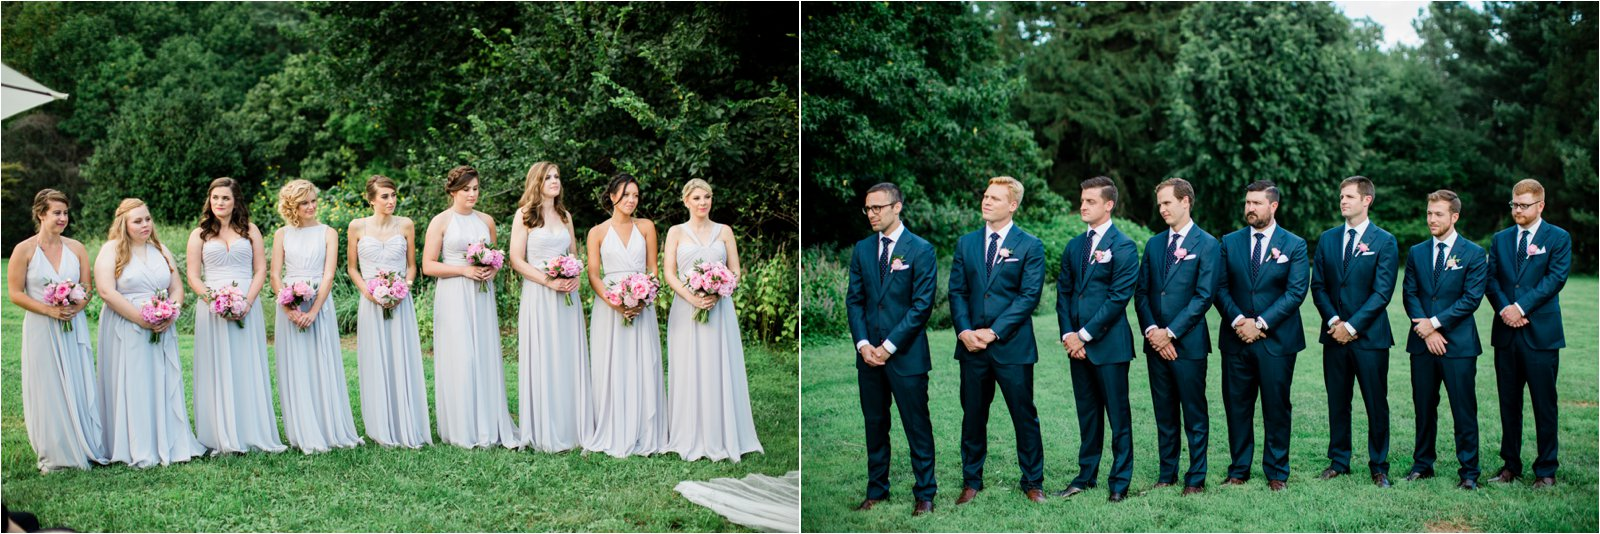 Baltimore Wedding Photographer_085.jpg